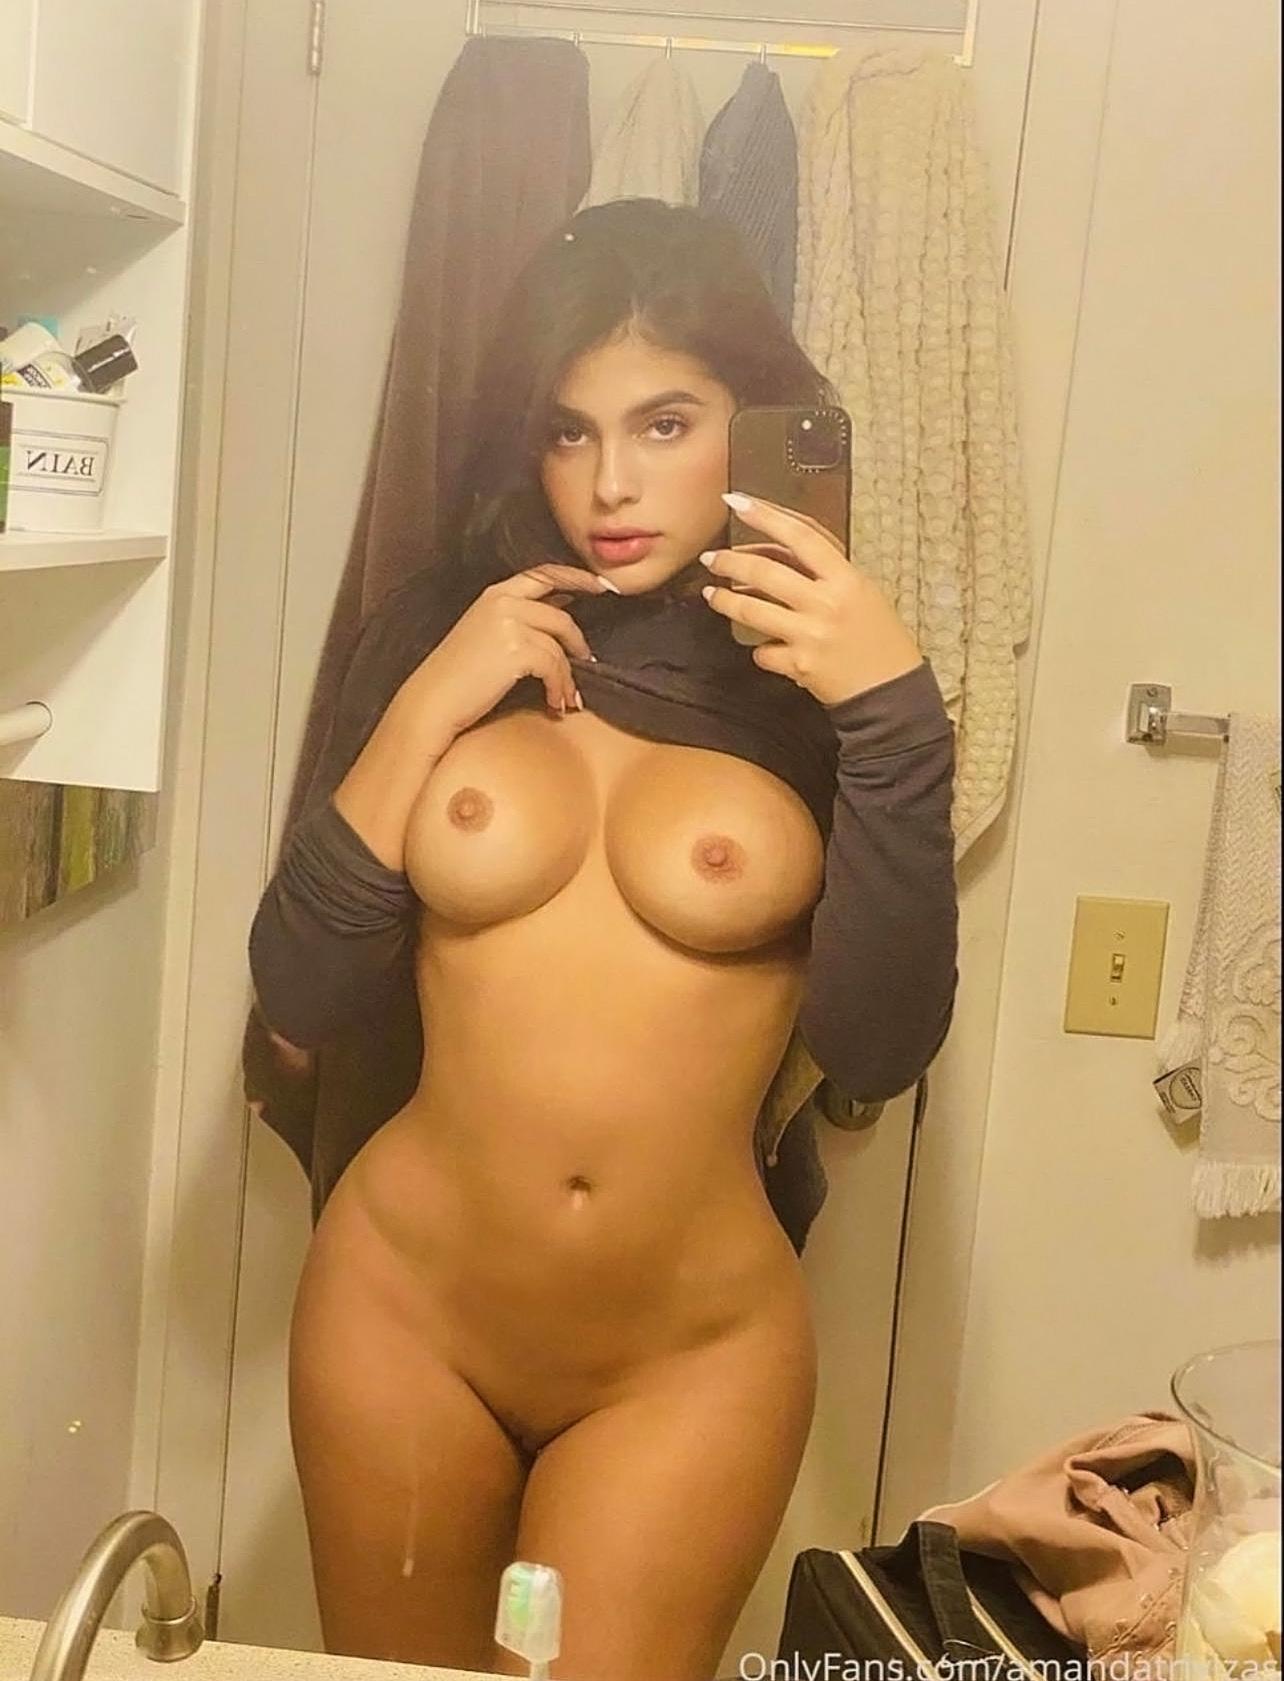 Amanda Trivizas Nude LEAKED Pics and Porn Video With Tyga 2